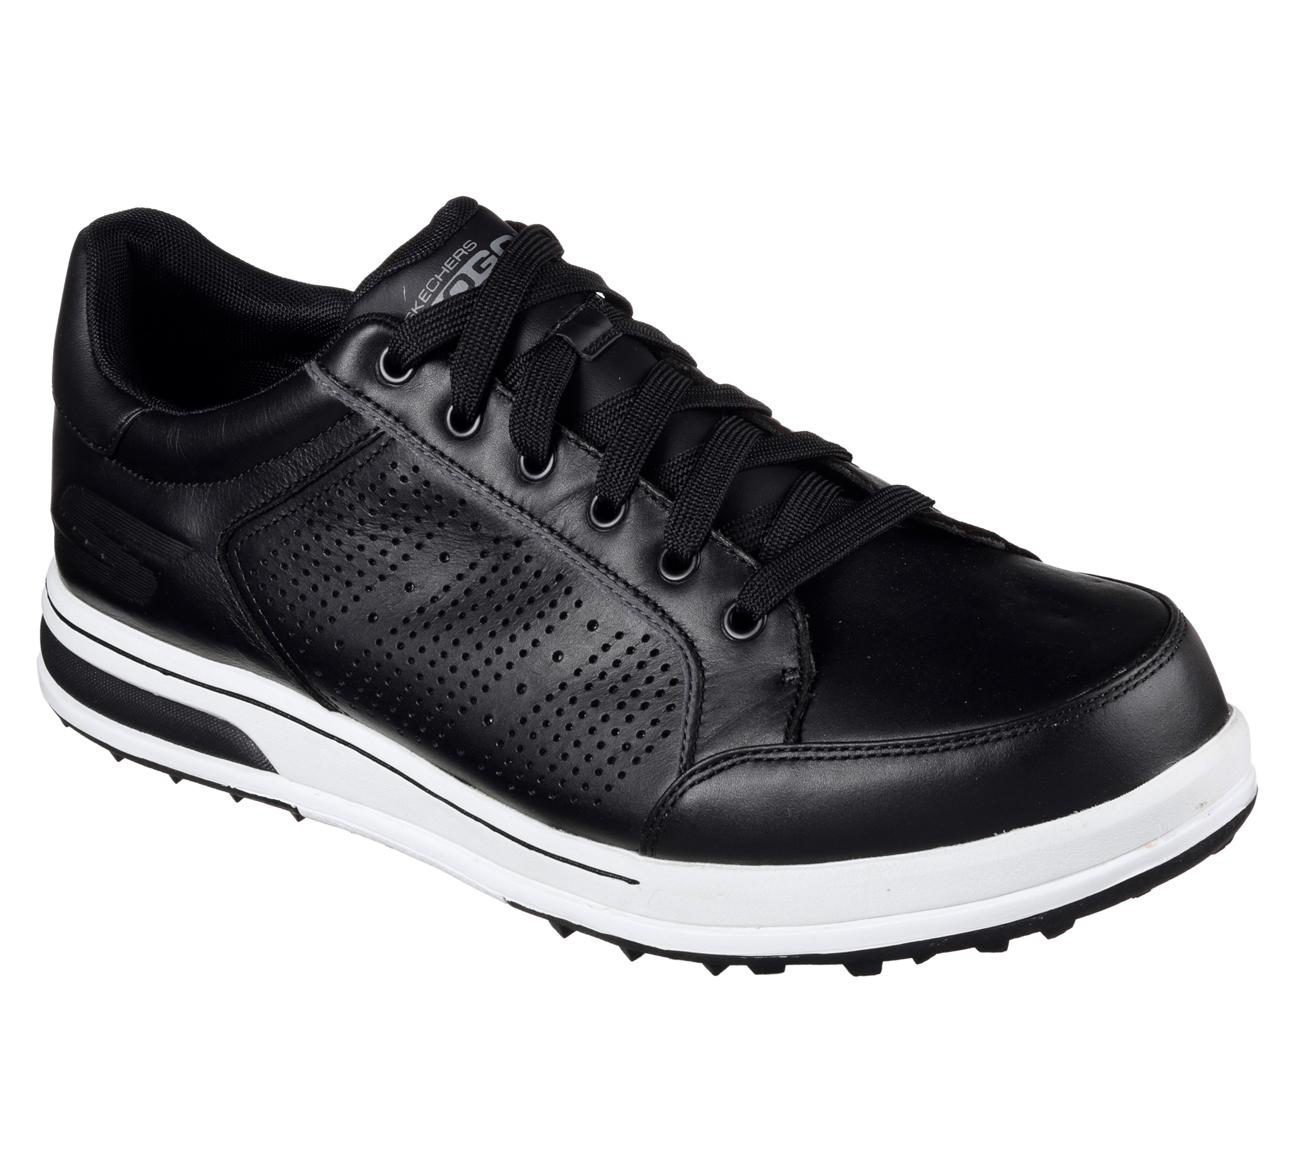 Buy Skechers Skechers Go Golf Drive 2 Lx Skechers